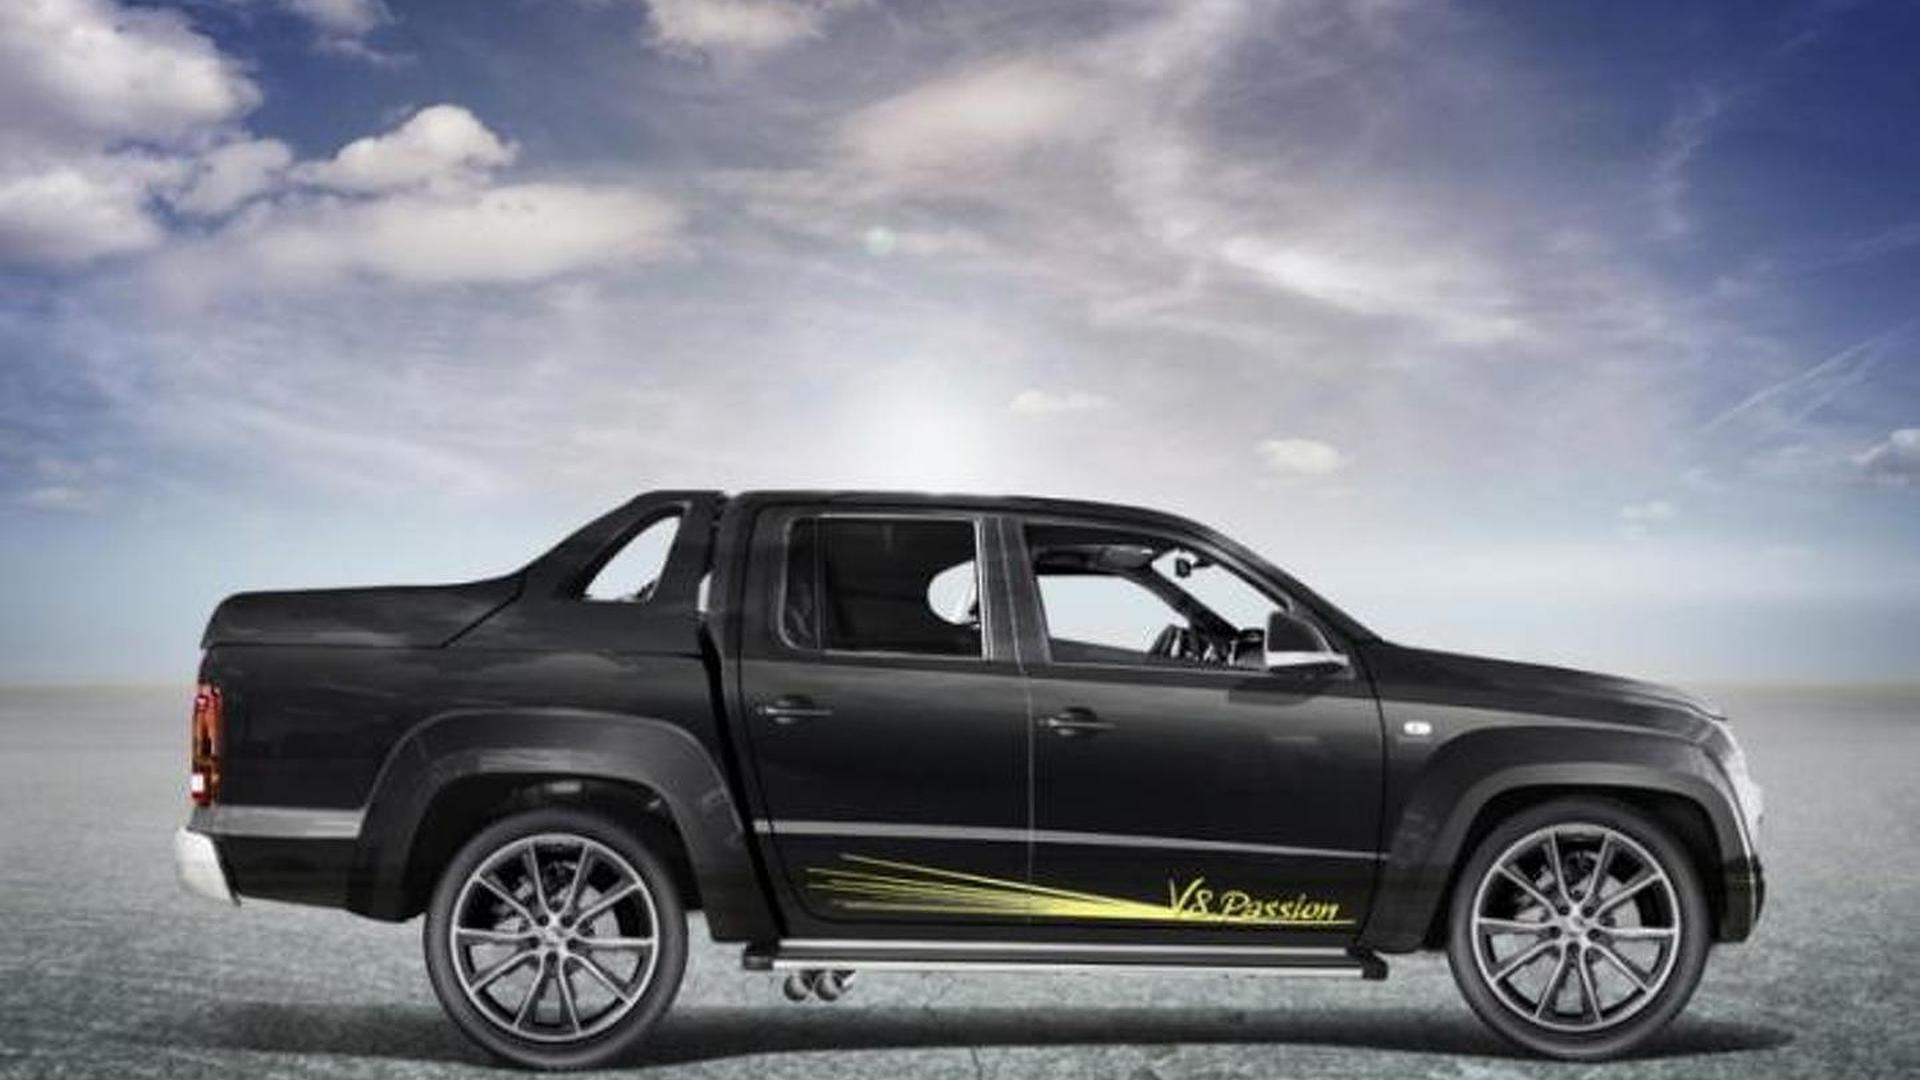 Mtm Bringing V8 Powered Volkswagen Amarok To Geneva